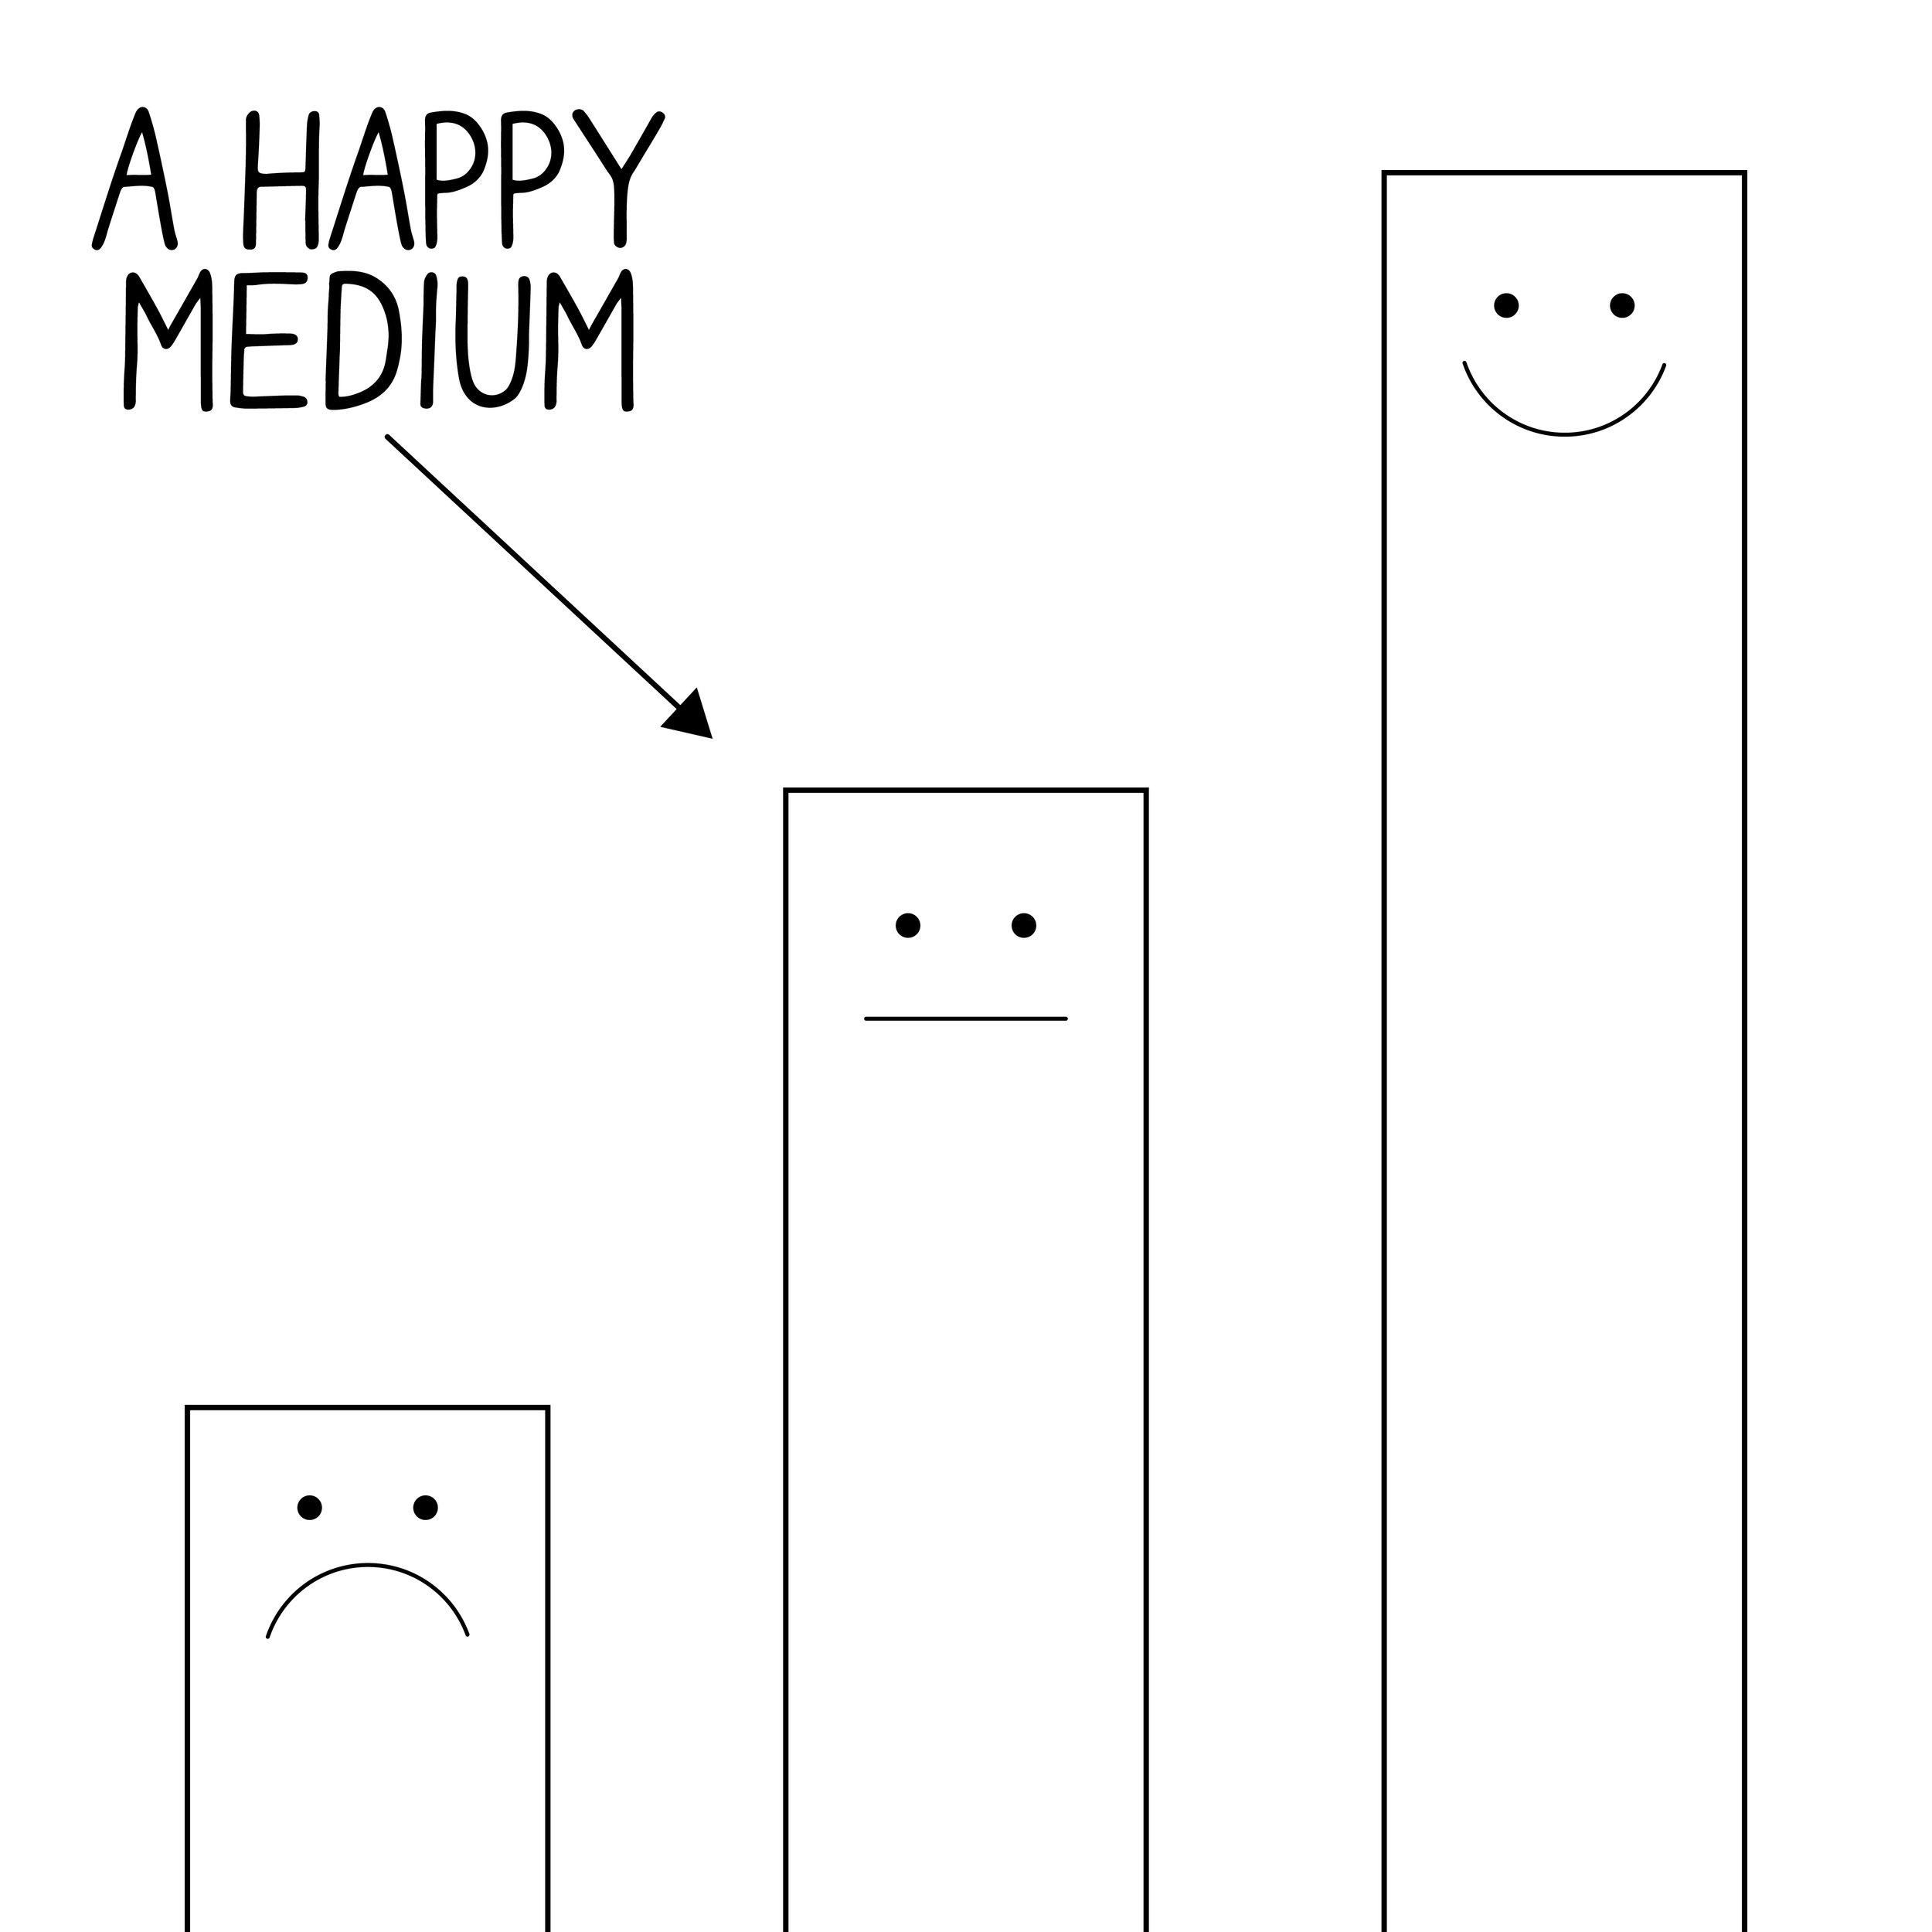 happymedium-01.jpg